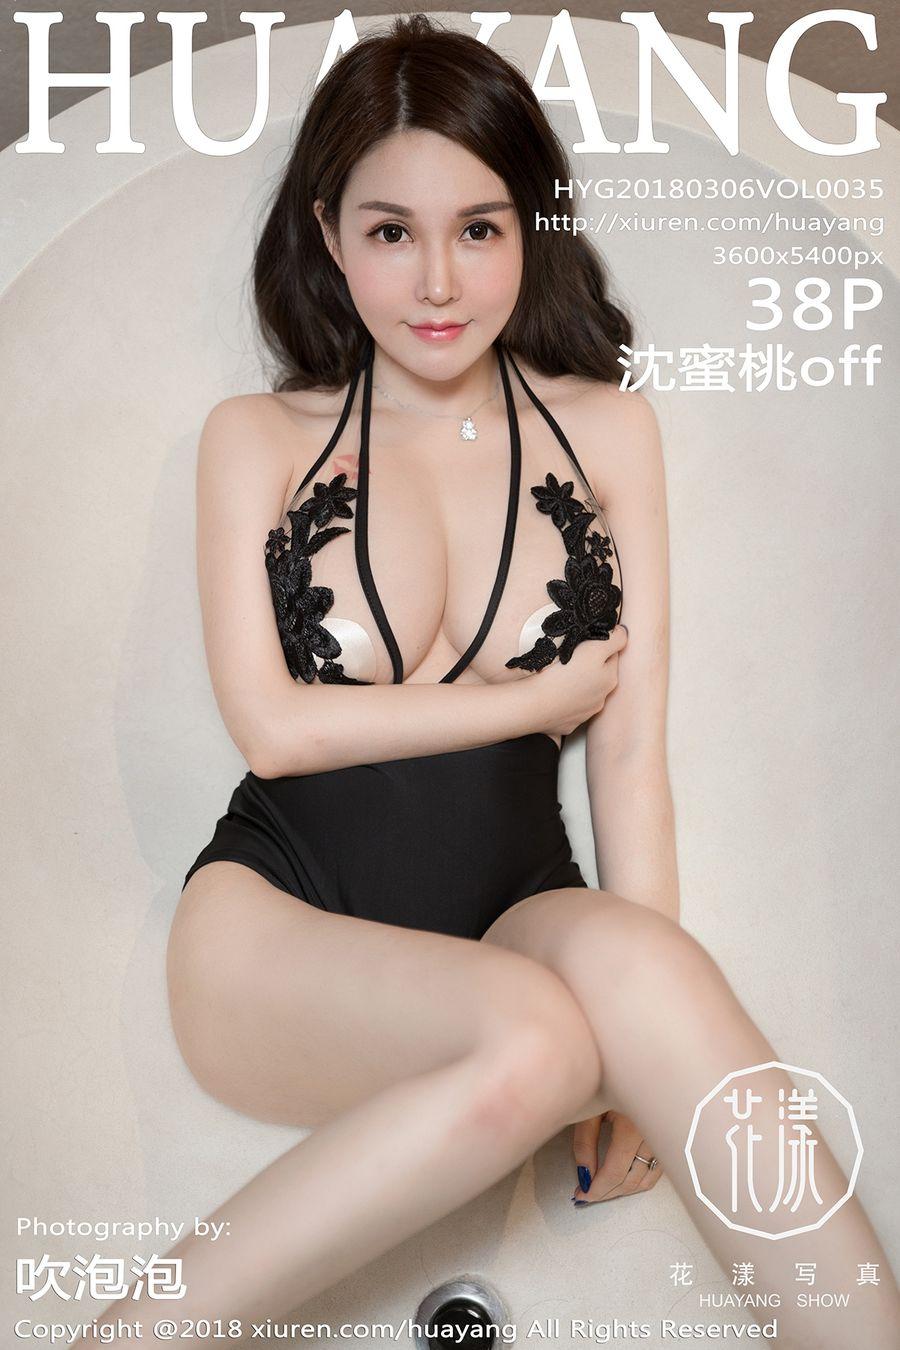 [HuaYang花漾] VOL.035 沈蜜桃off [38+1P/103M]